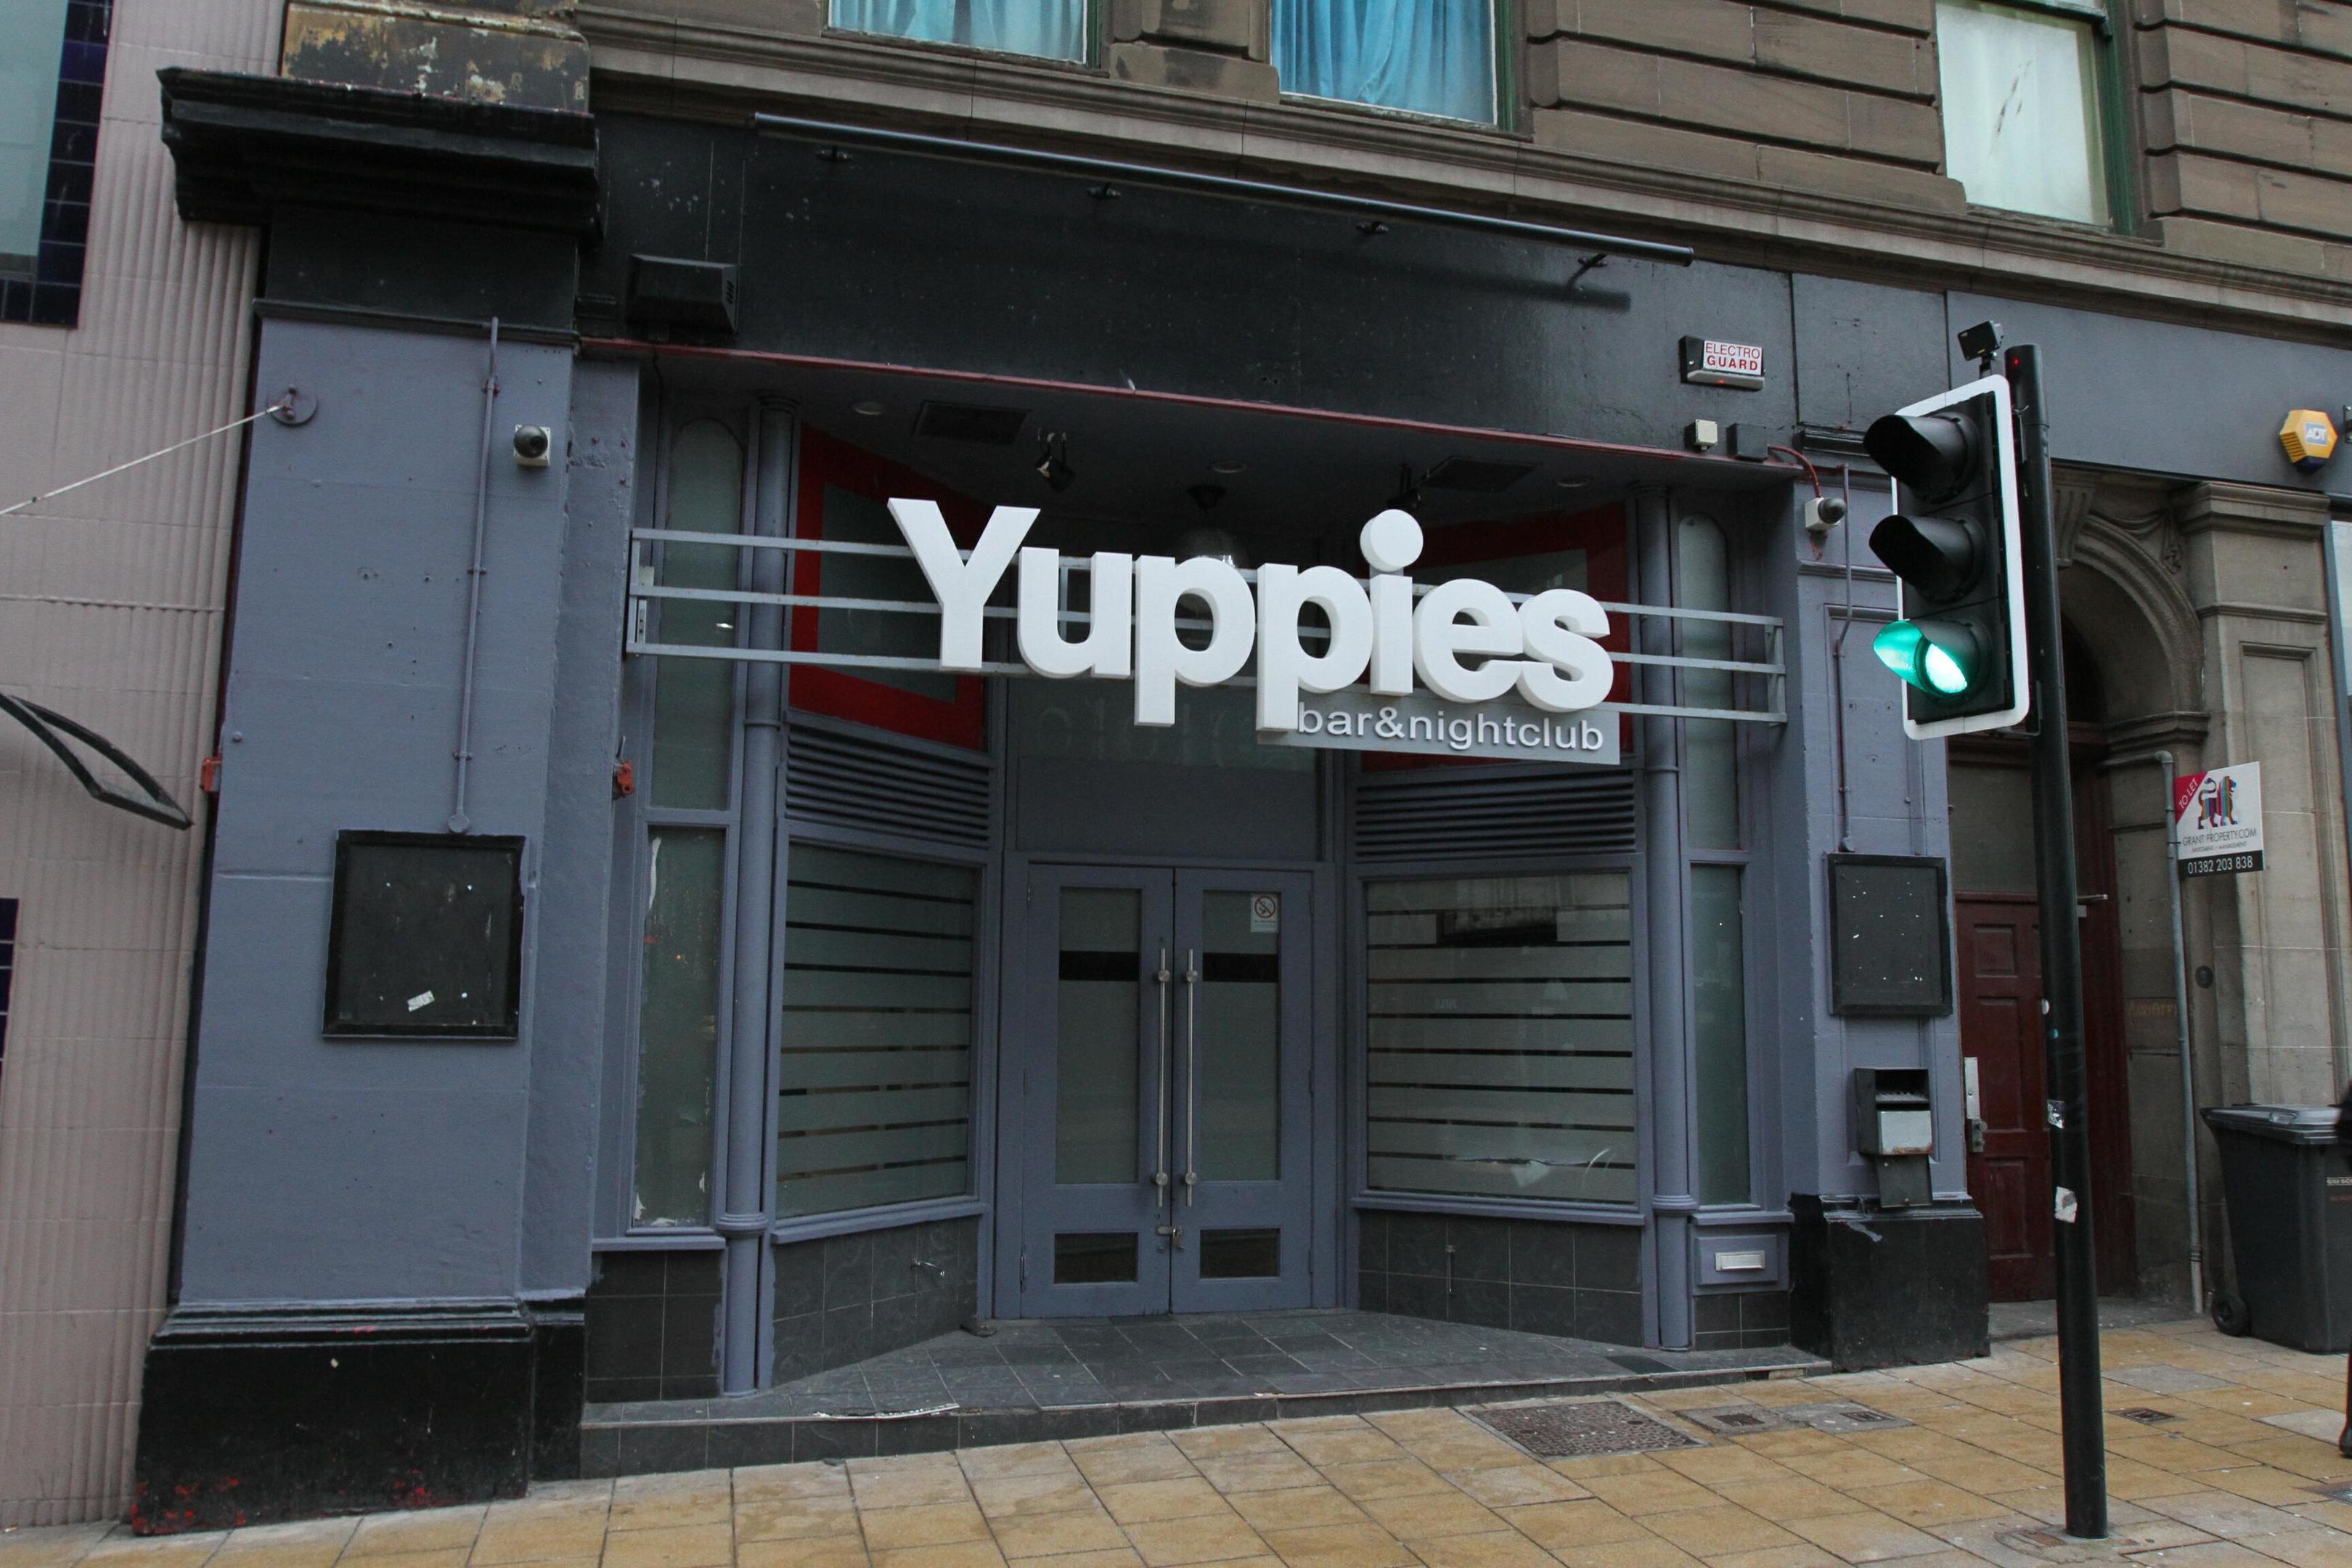 The then-Yuppies nightclub